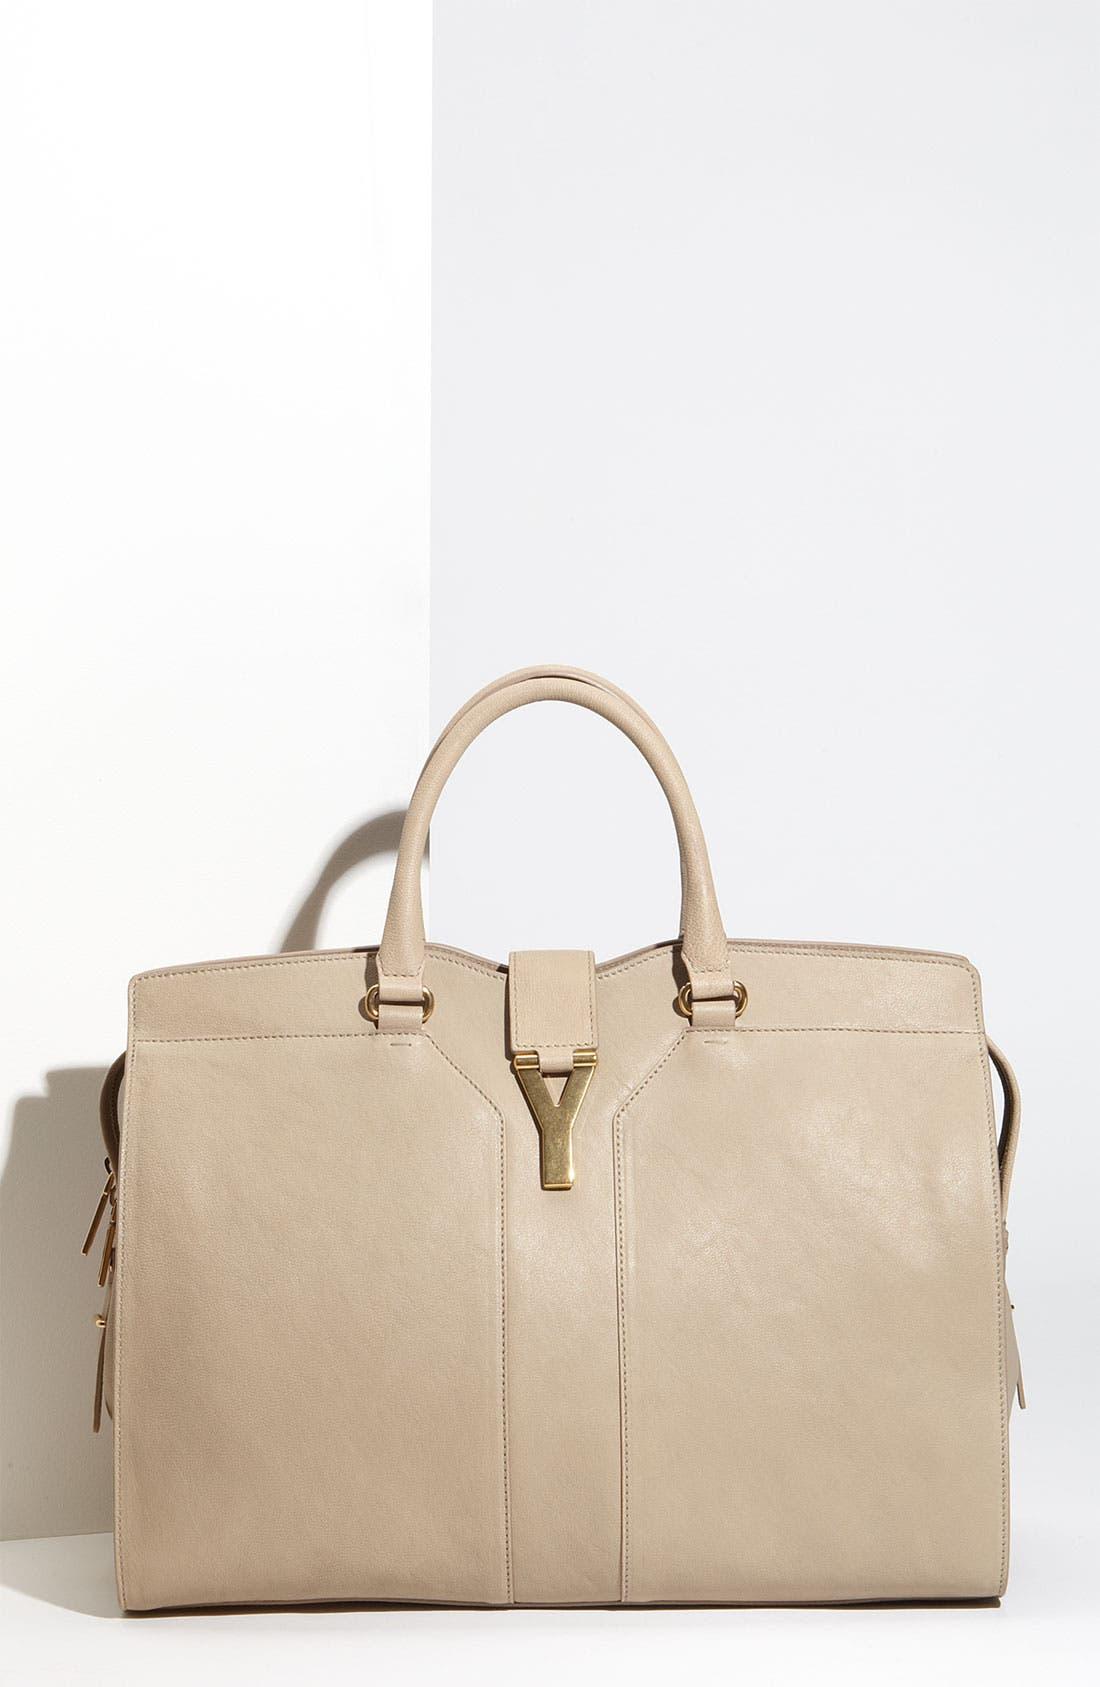 Main Image - Yves Saint Laurent 'Cabas Chyc - Large' Leather Satchel